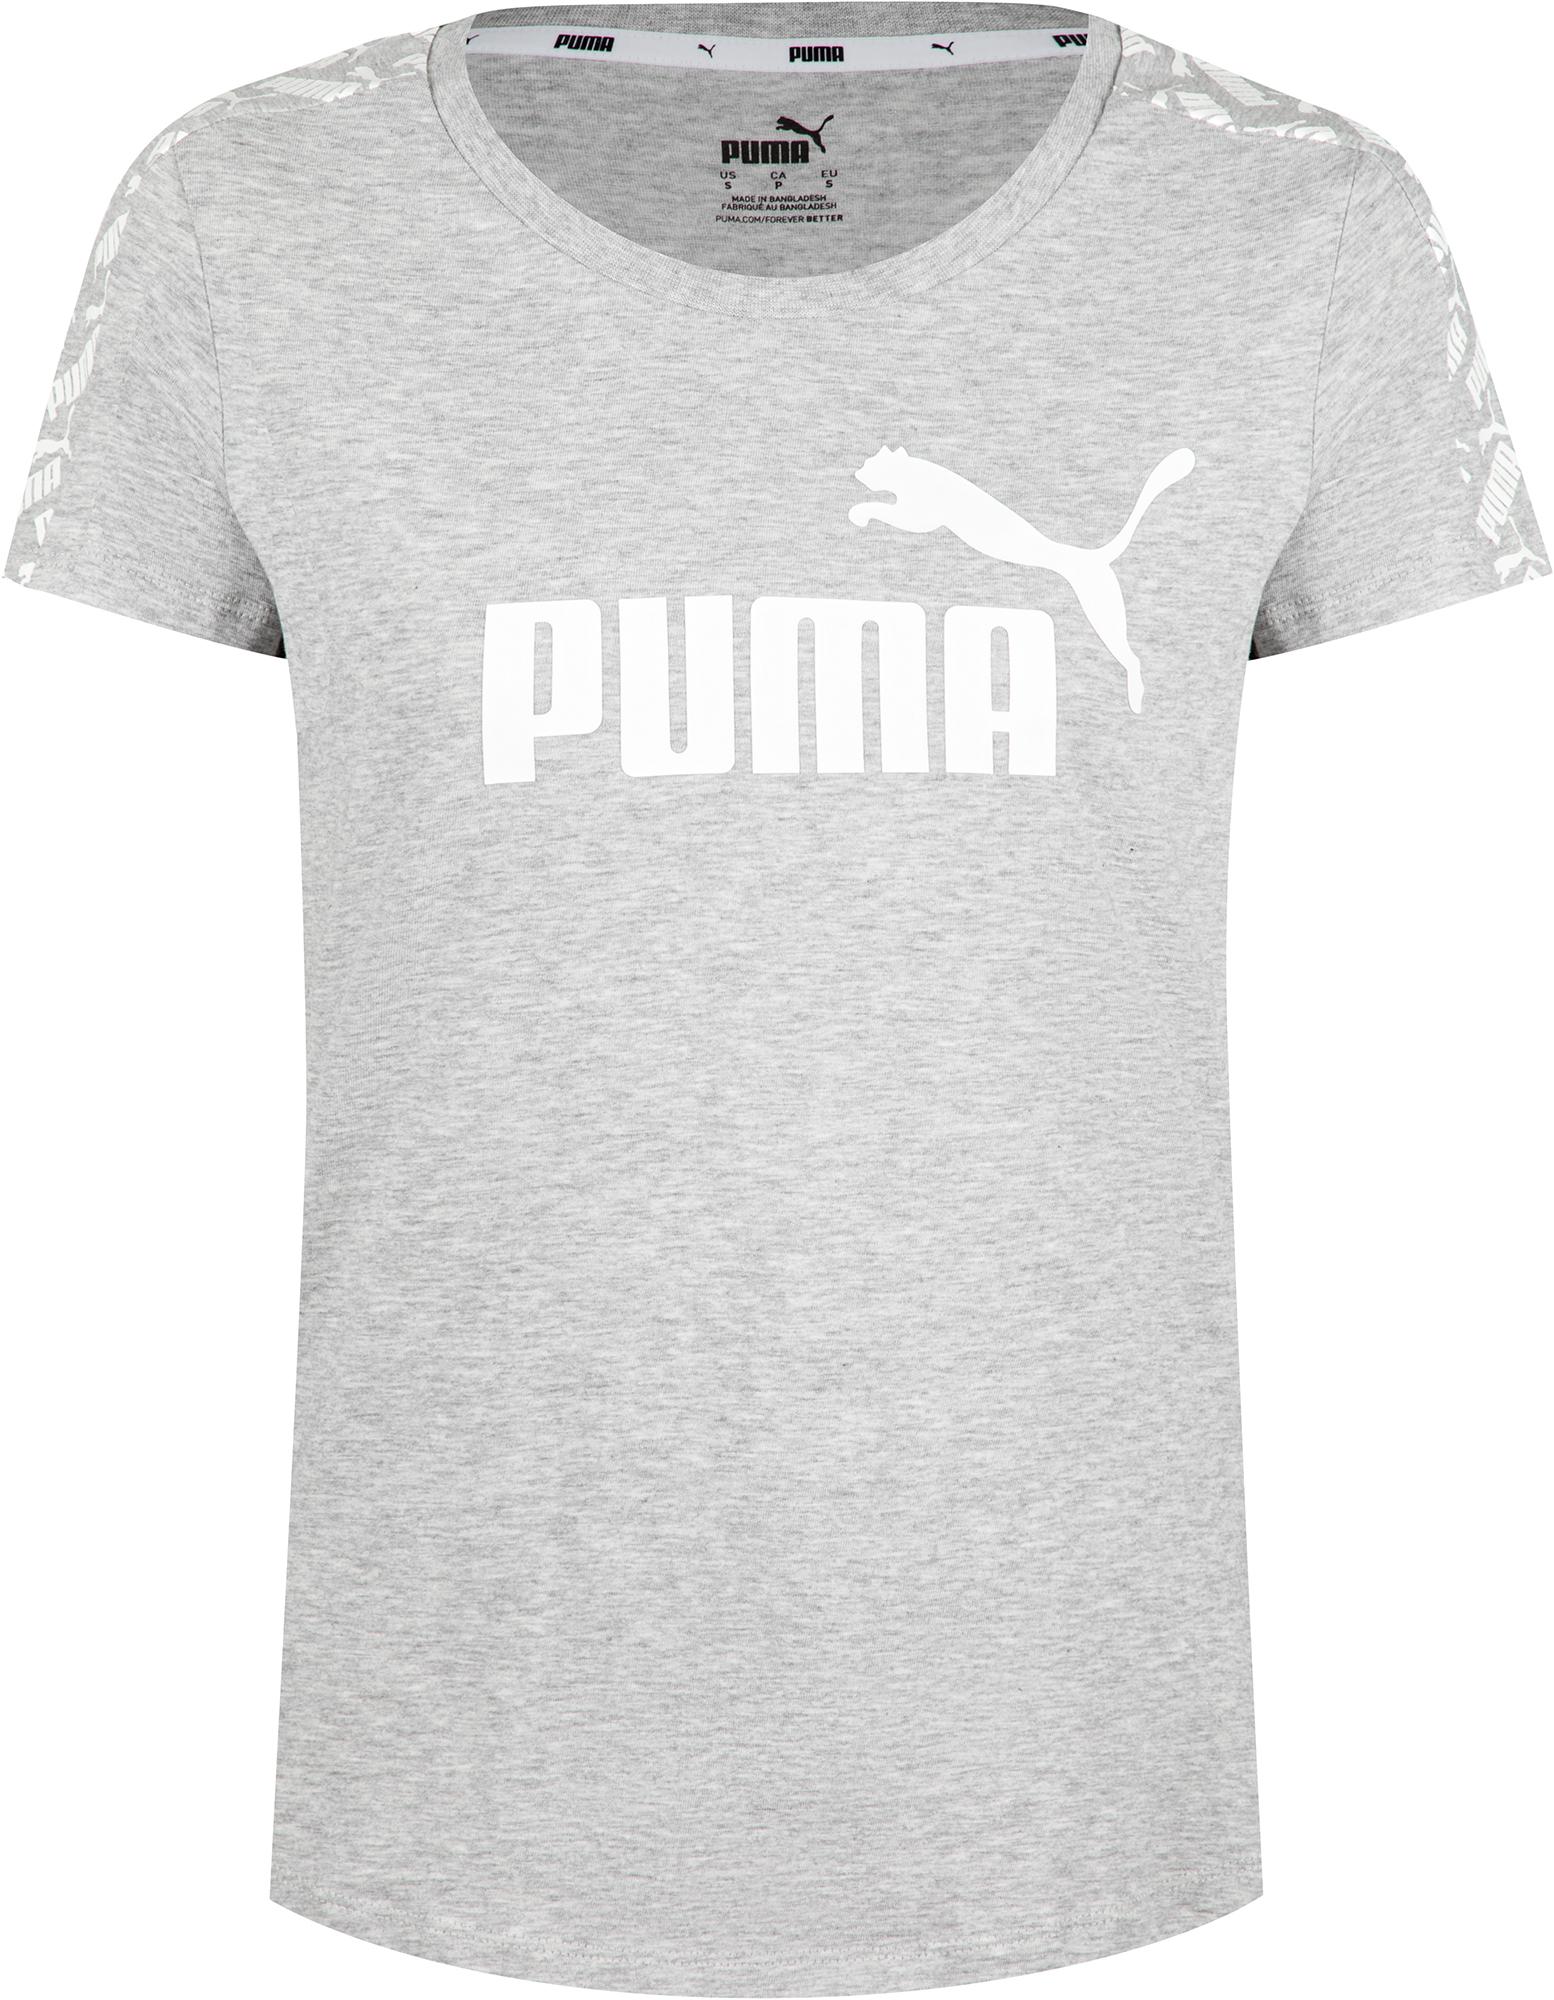 Puma Футболка женская Puma Amplified Tee, размер 42-44 футболка женская puma ess no 1 tee heather w цвет синий 83839920 размер s 42 44